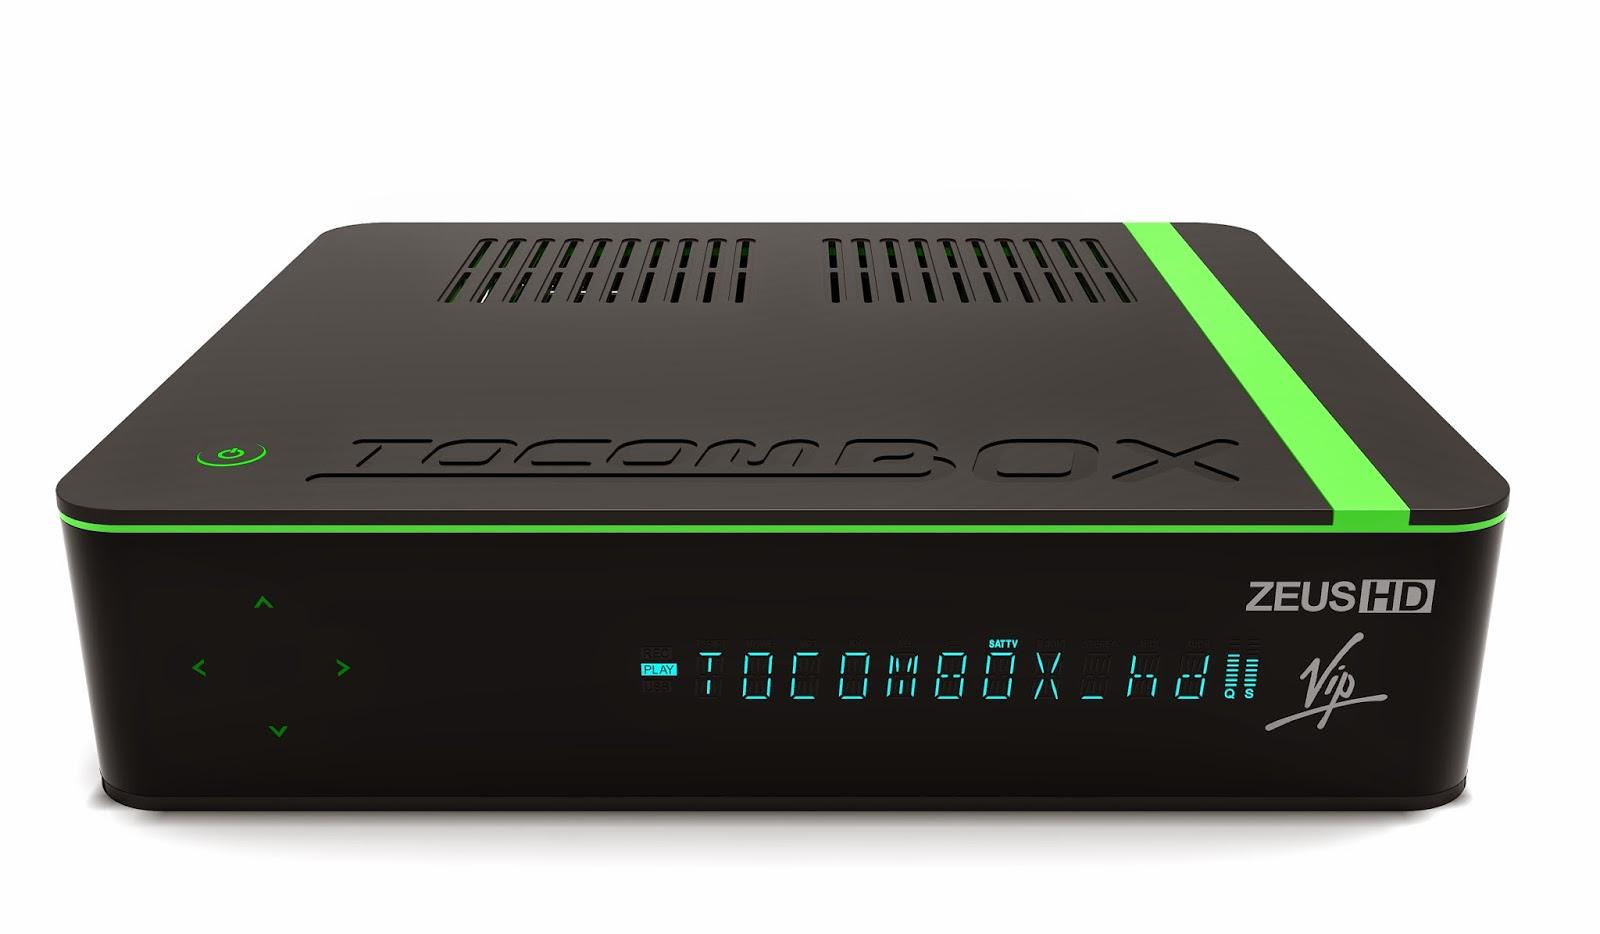 Colocar CS tocombox%2Bzeus%2Bvip Atualização Tocombox PFC VIP e ZEUS VIP 2015 comprar cs